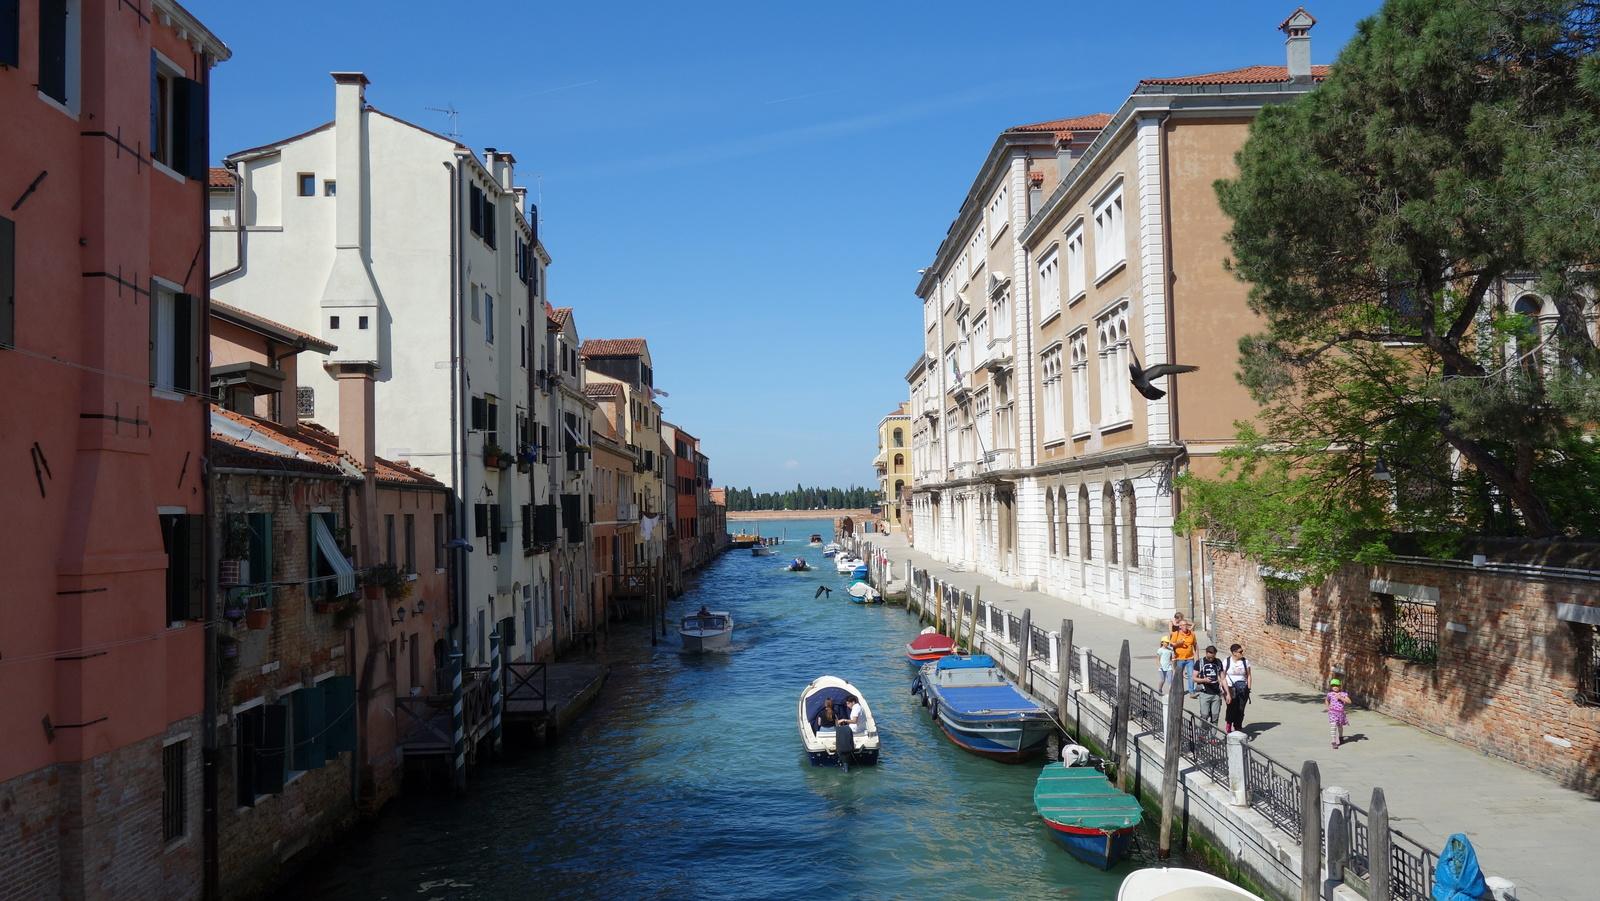 062 - Verso San Francesco della Vigna